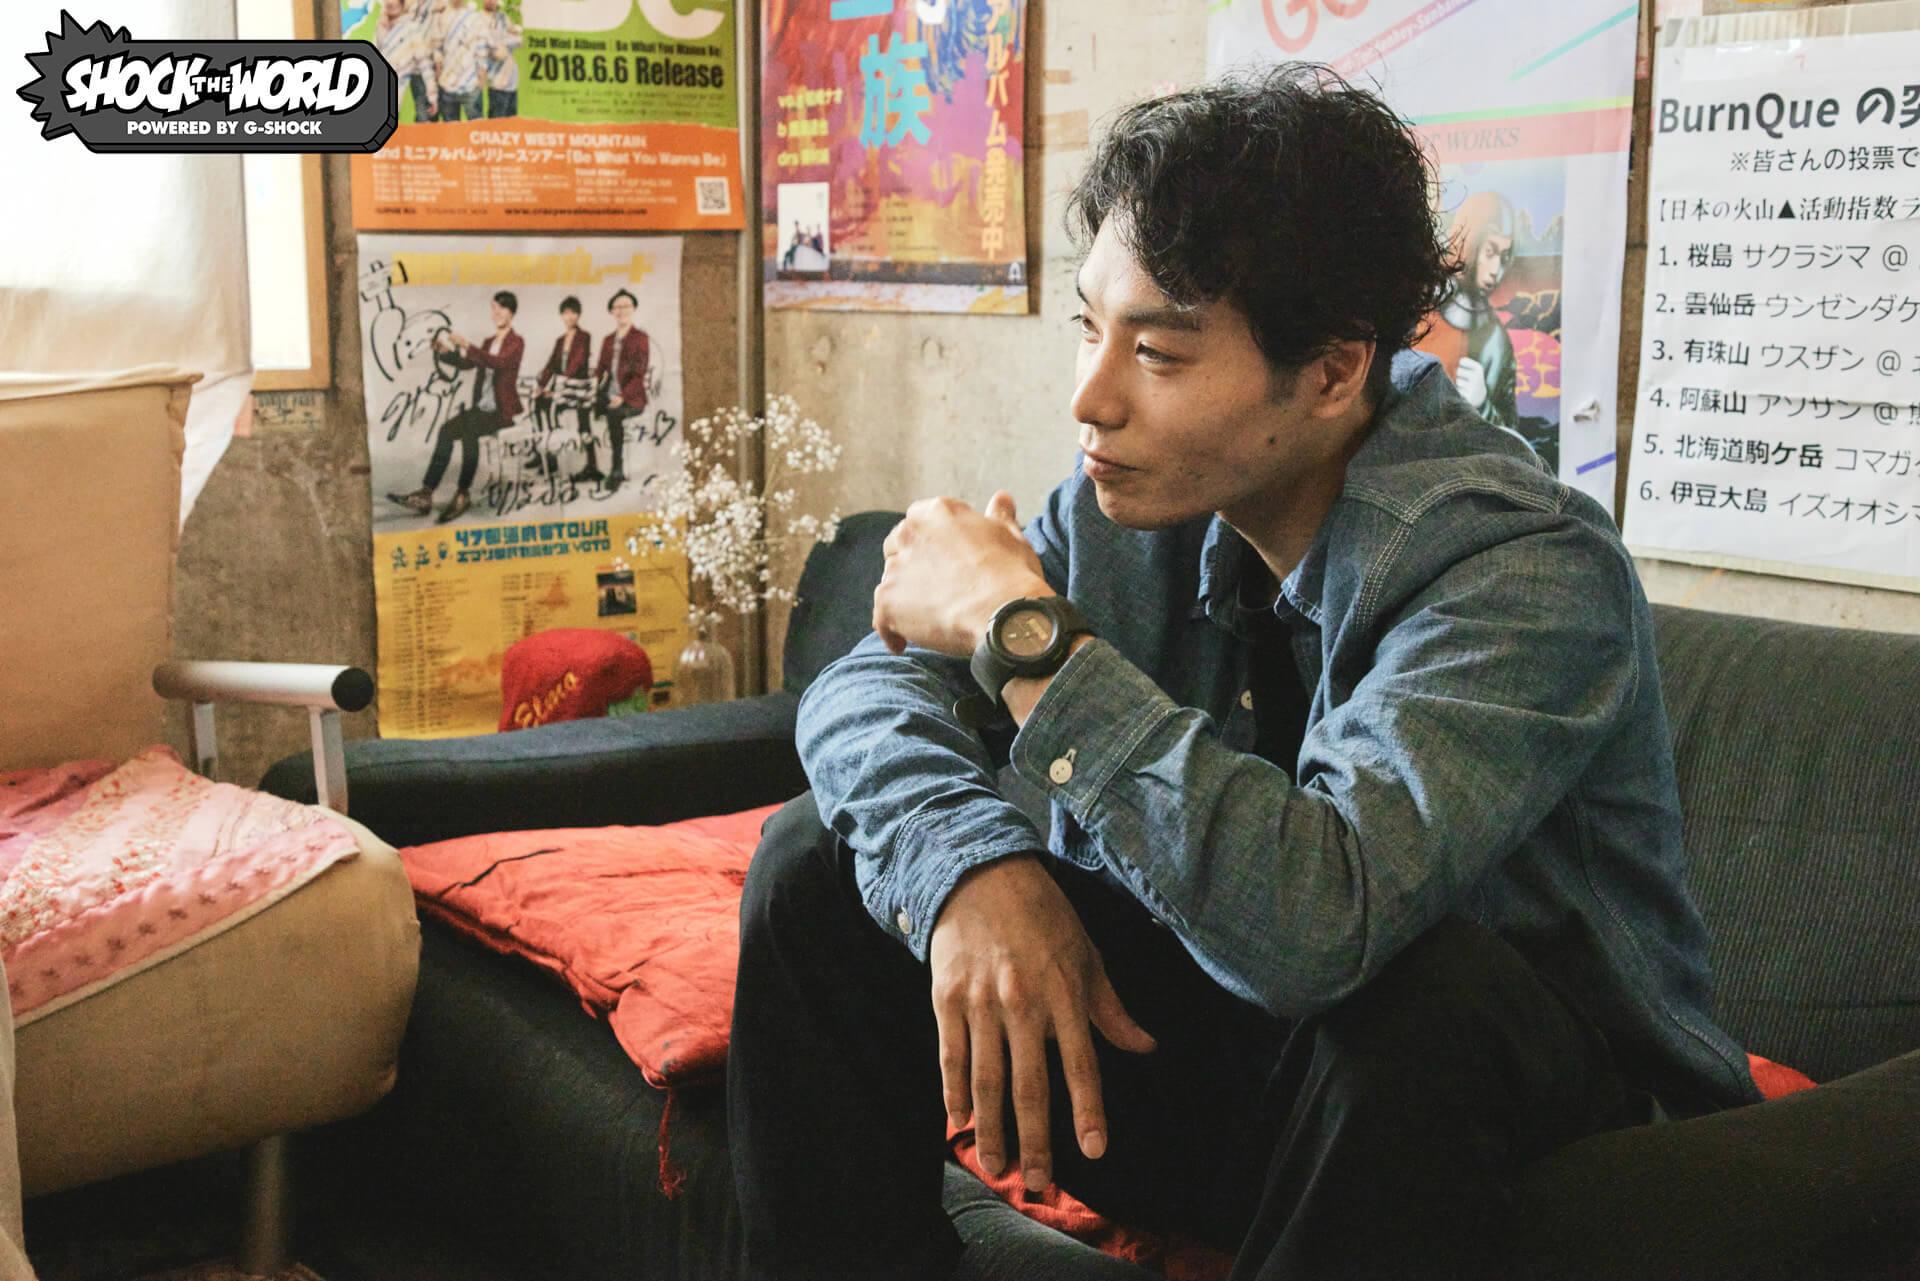 G-SHOCK『SHOCK THE WORLD』にTENDRE、Ryohuが登場!ふたりによる対談映像が解禁 life210614_tendre_ryohu_2